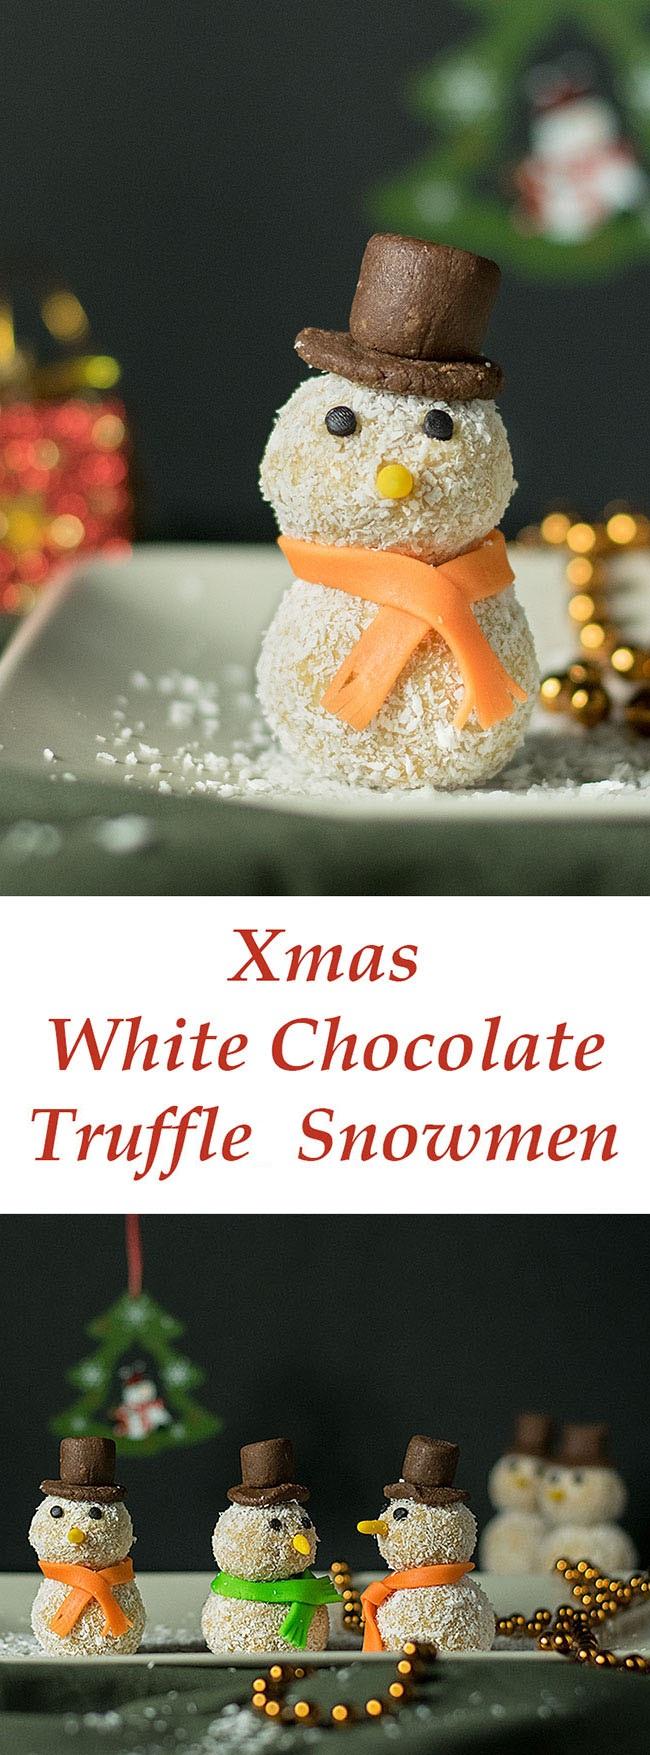 xmas-white-chocolate-truffle-snowmen-5